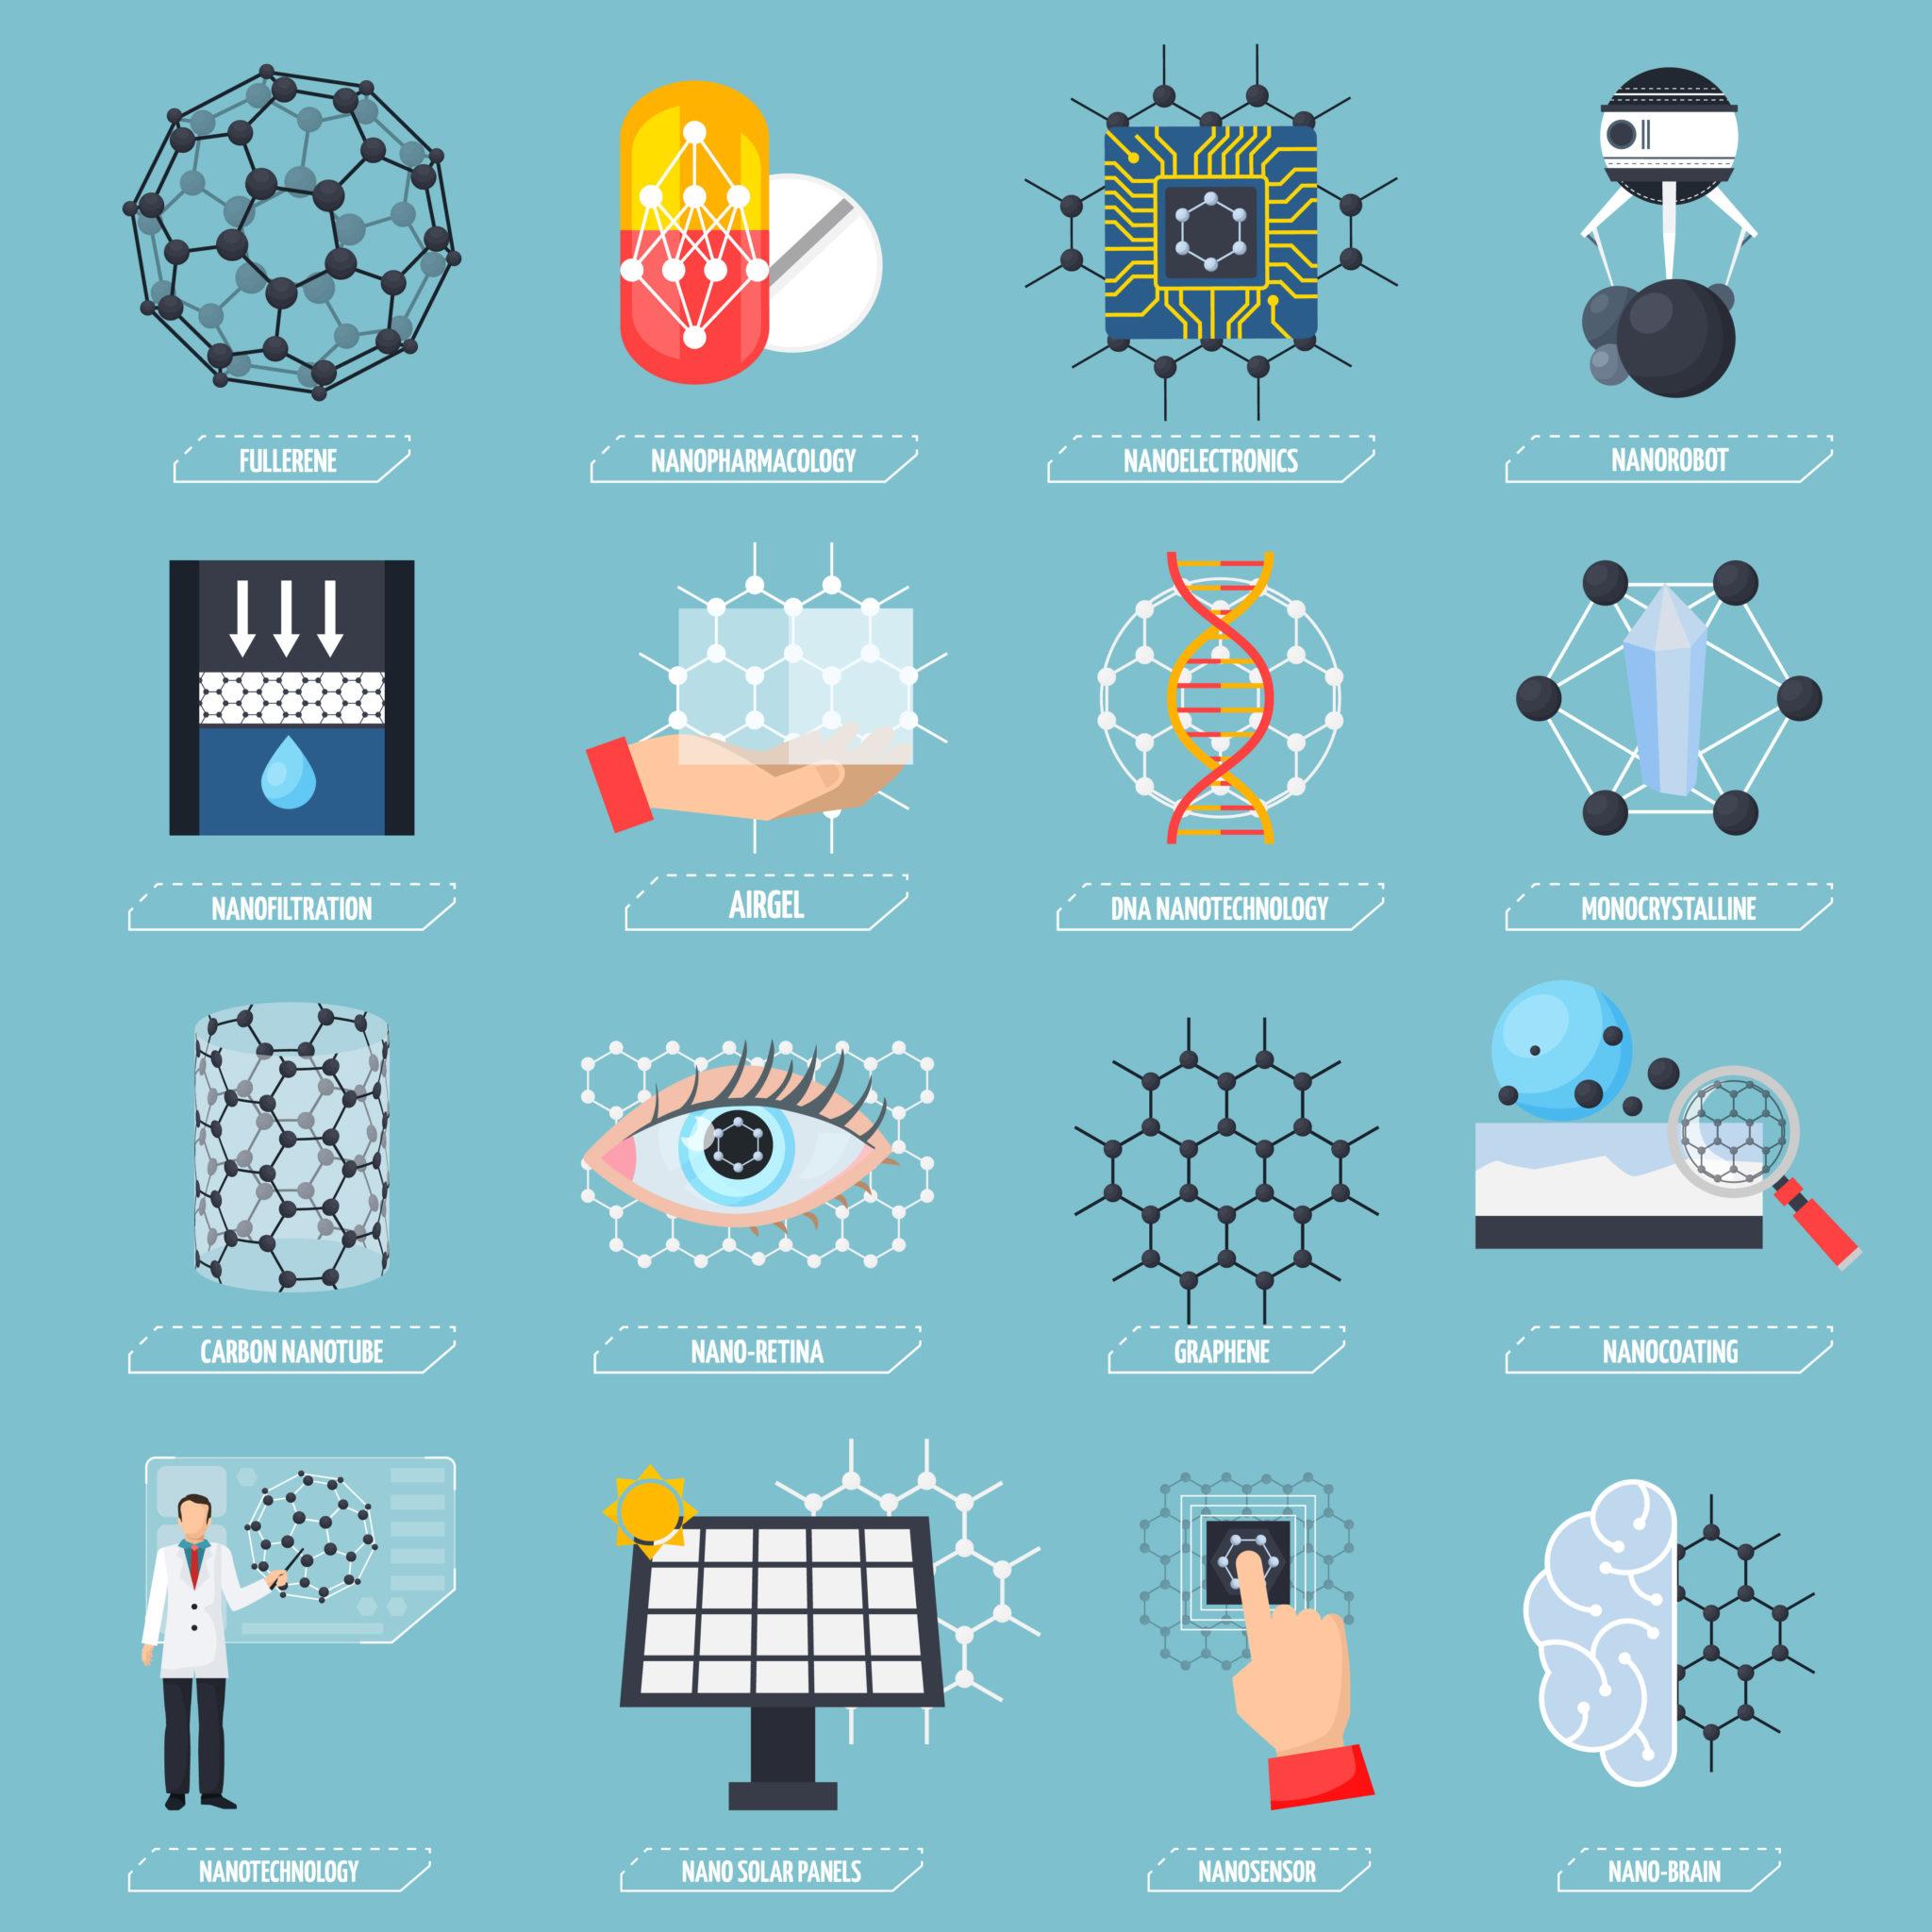 nanotecnologie e proprietà intellettuale